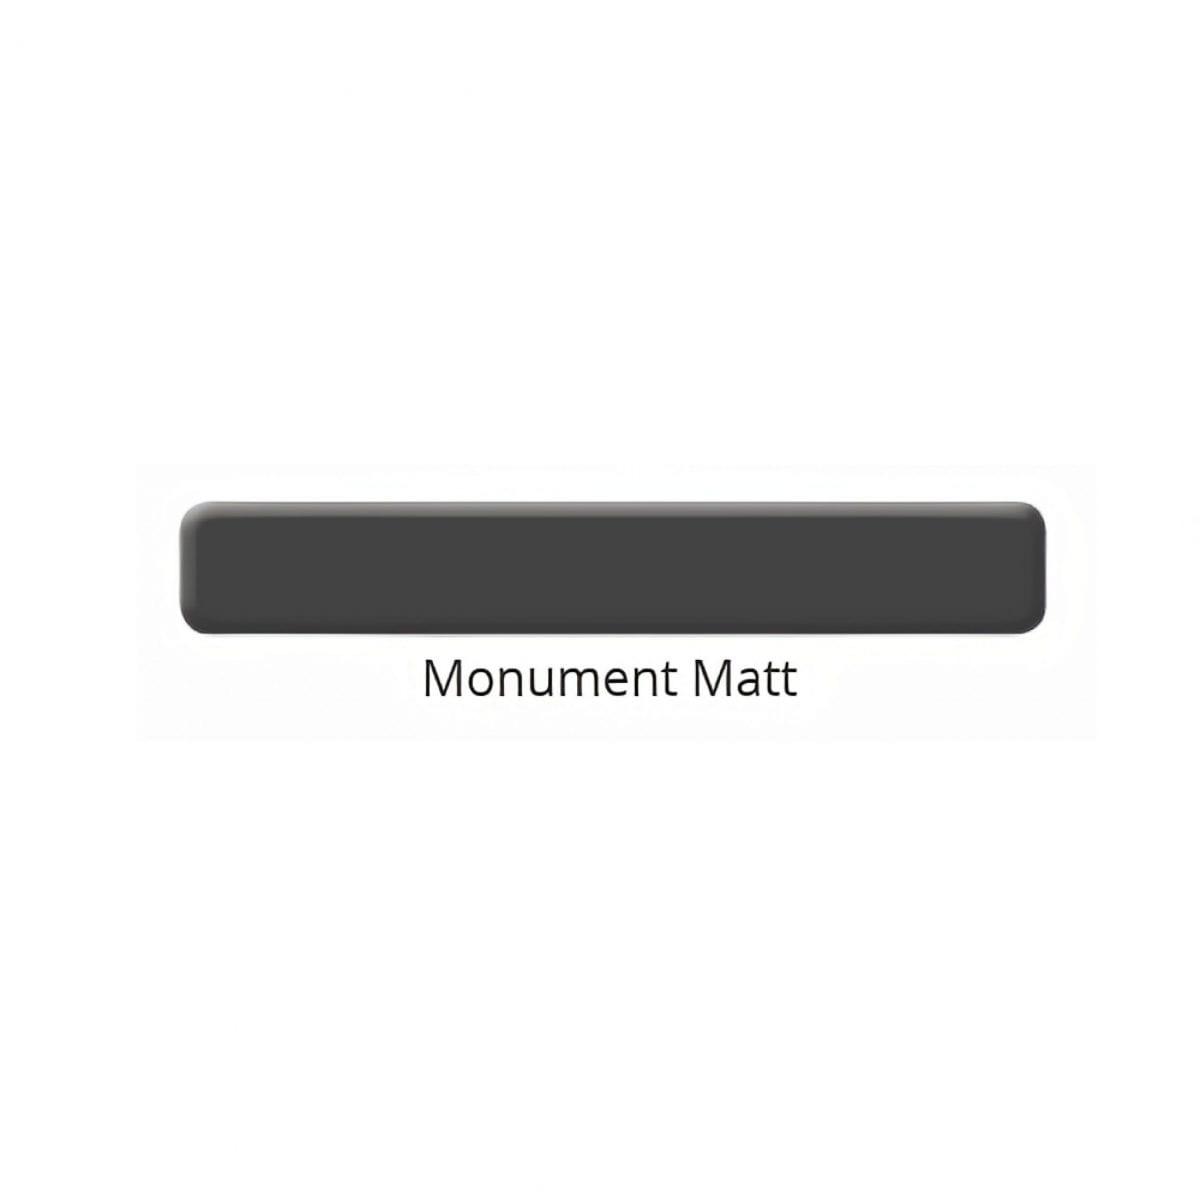 Monument Matt